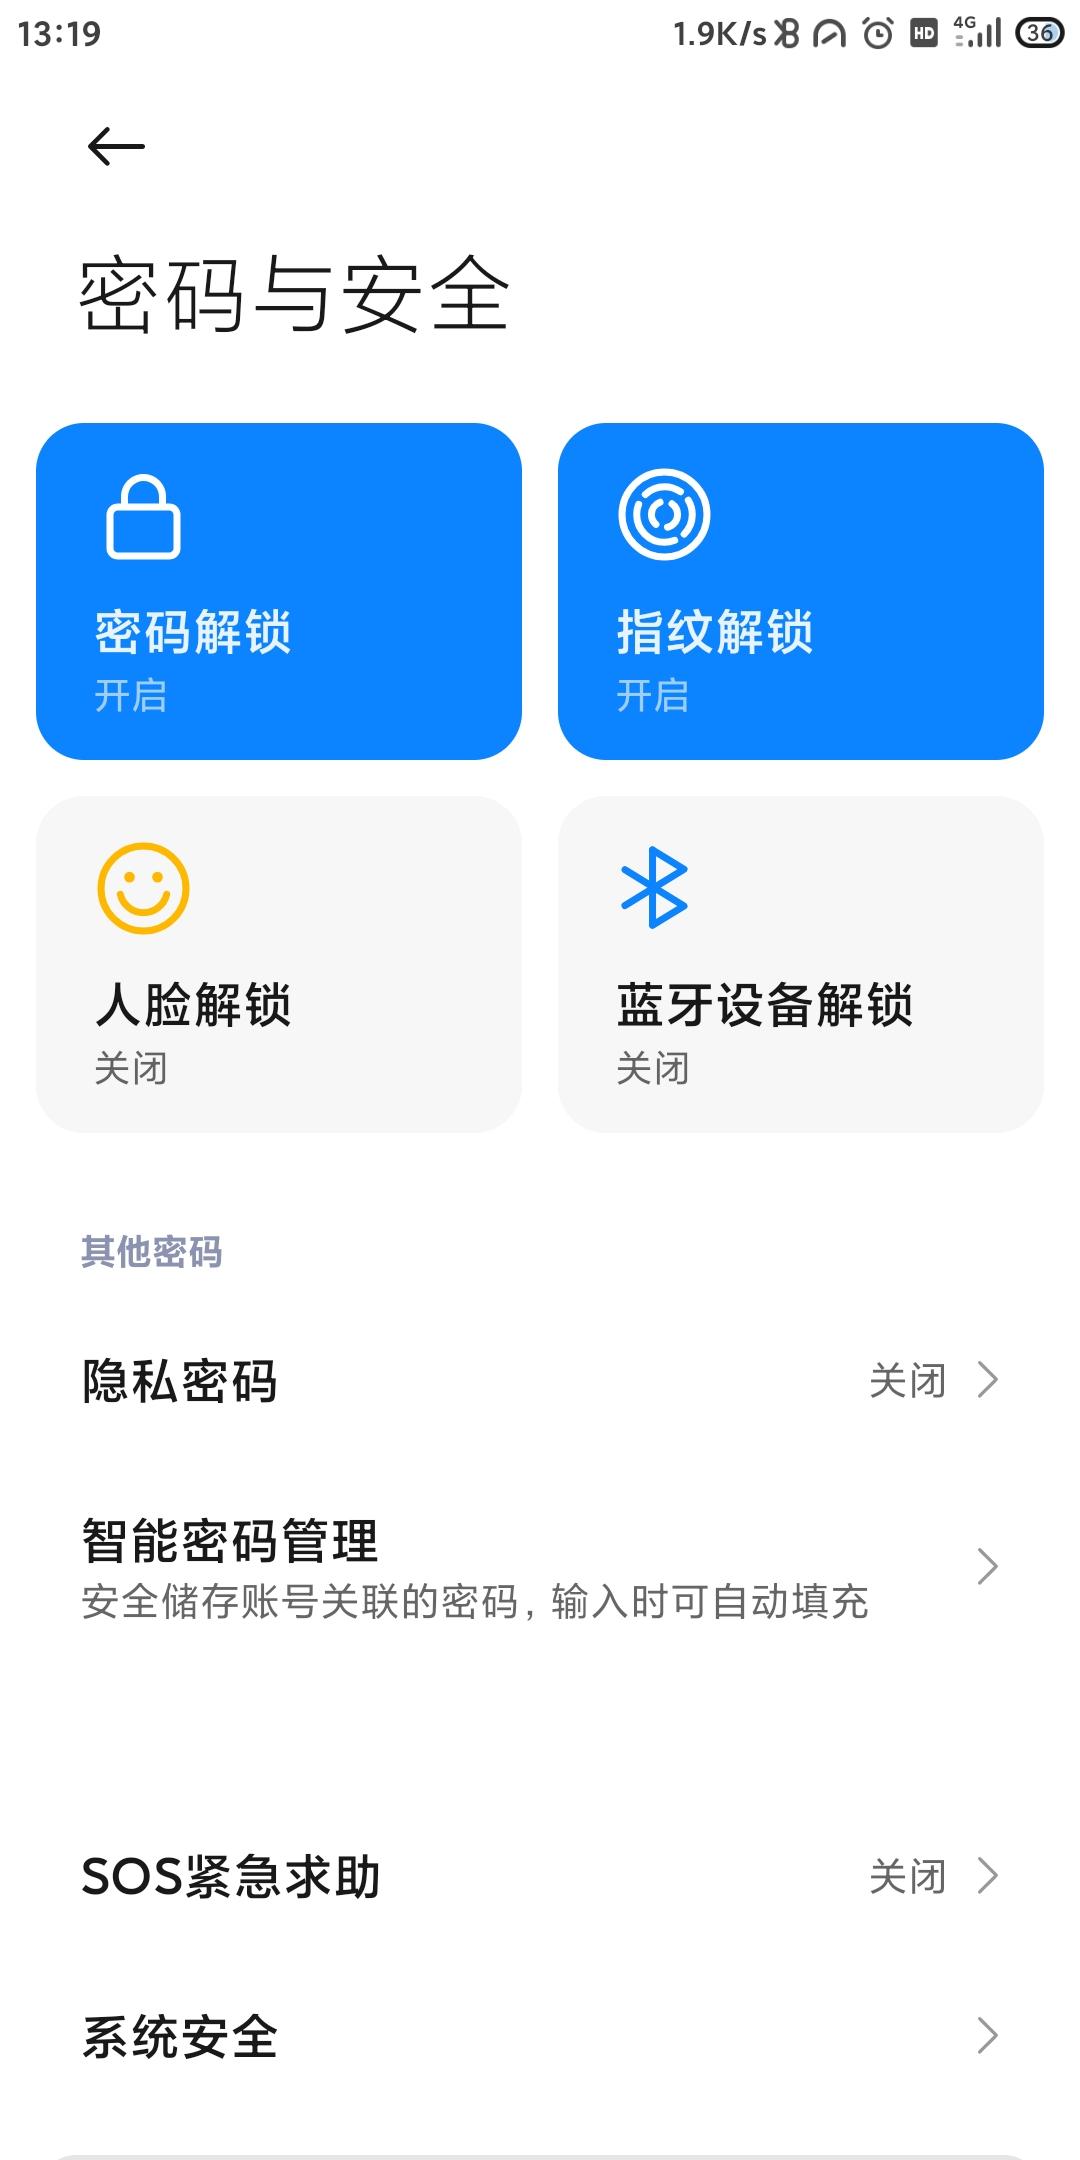 Screenshot_2020-09-14-13-19-29-185_com.android.se.jpg